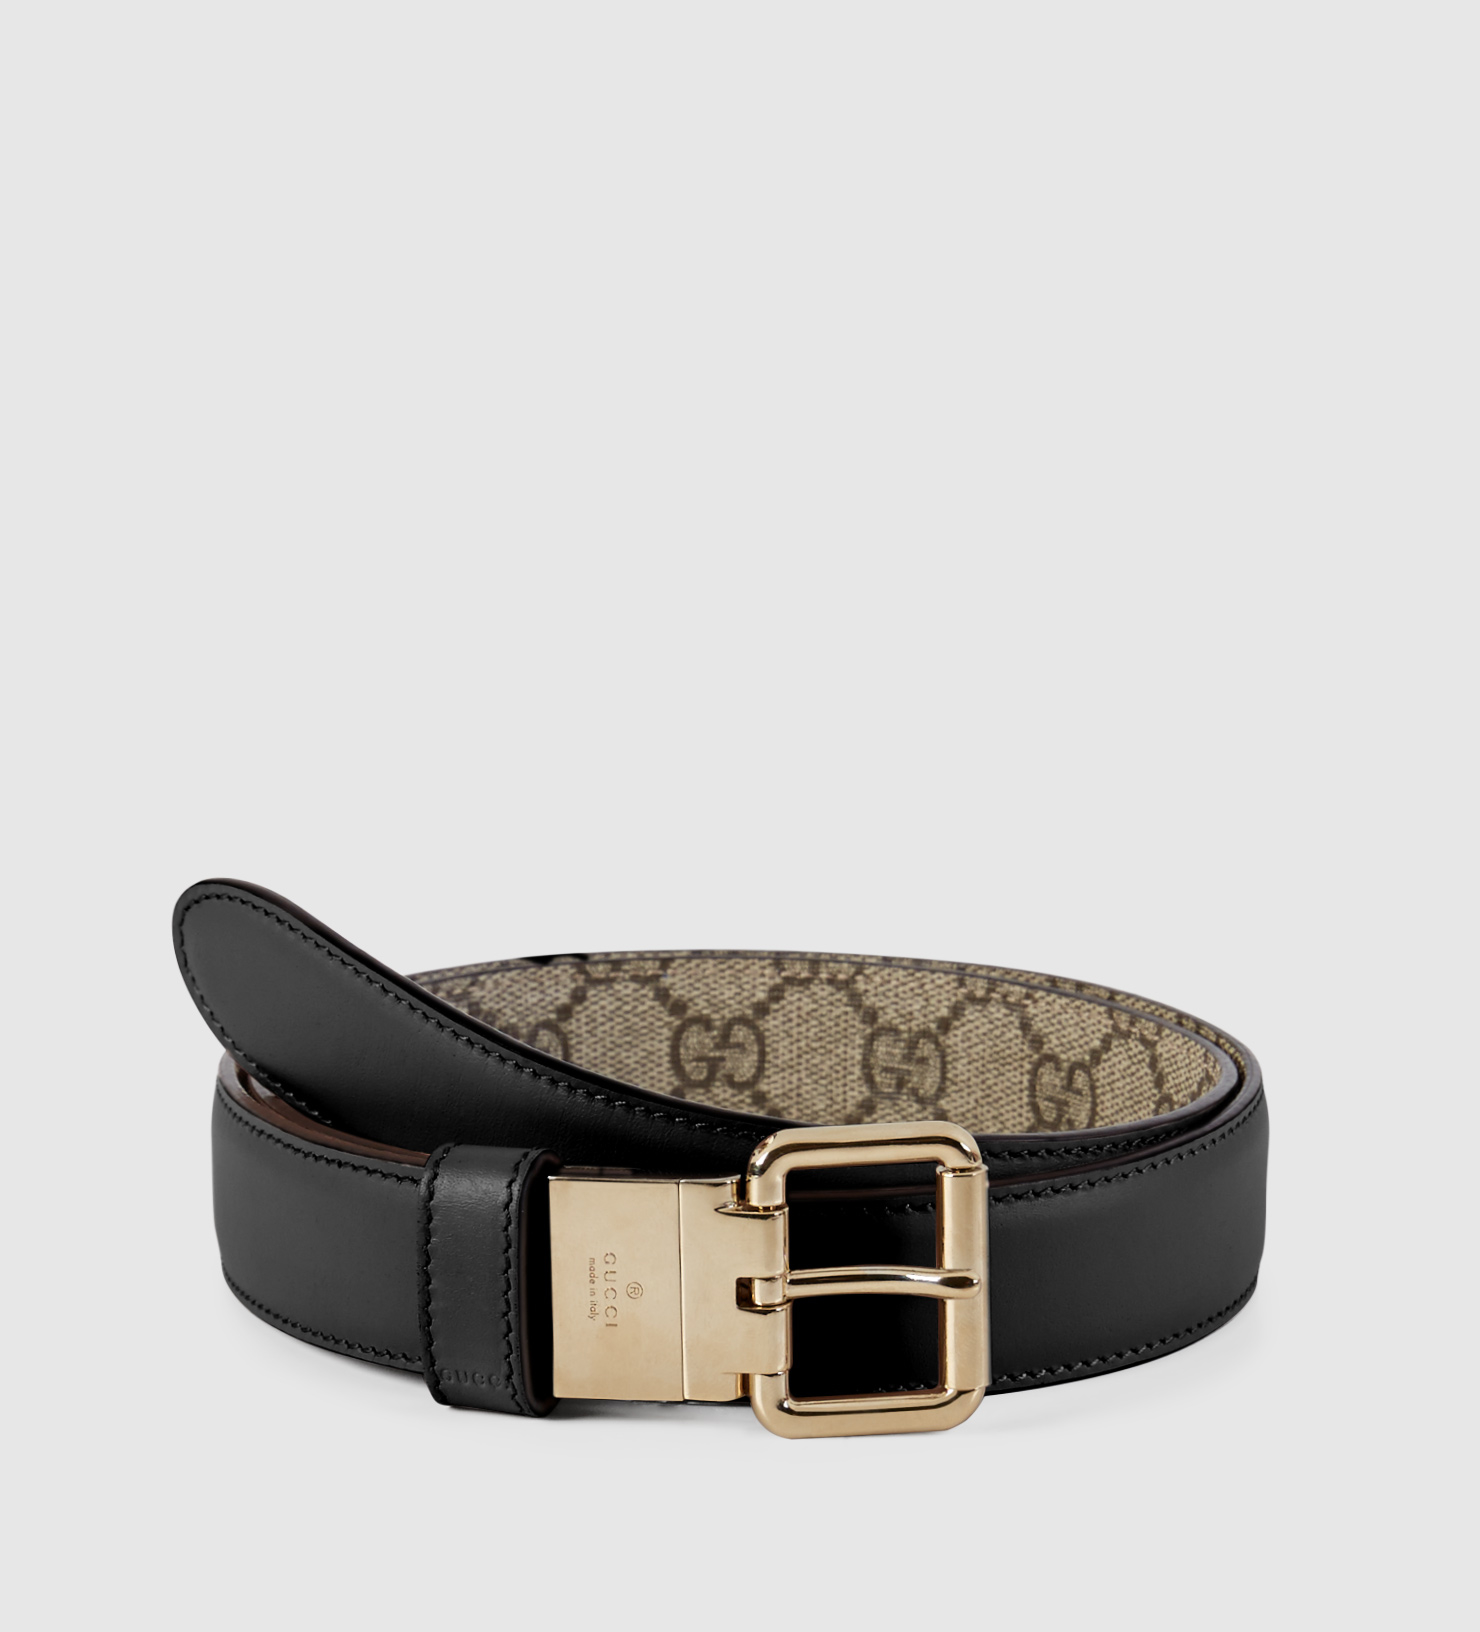 b9e69e222 Gucci Reversible Leather And Gg Supreme Belt in Black - Lyst